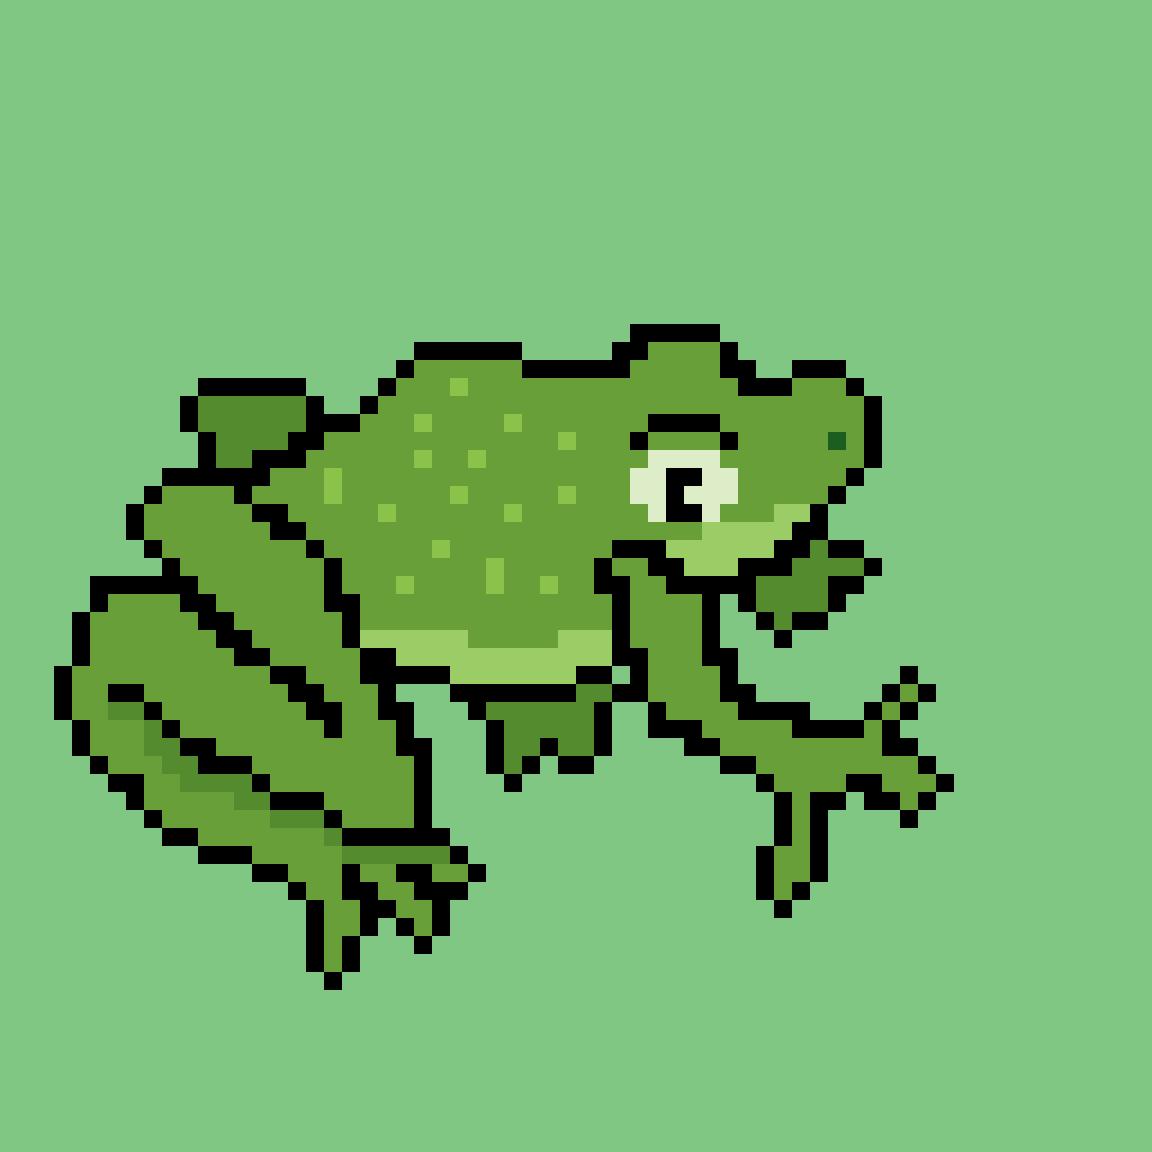 Froggo by chicorico101